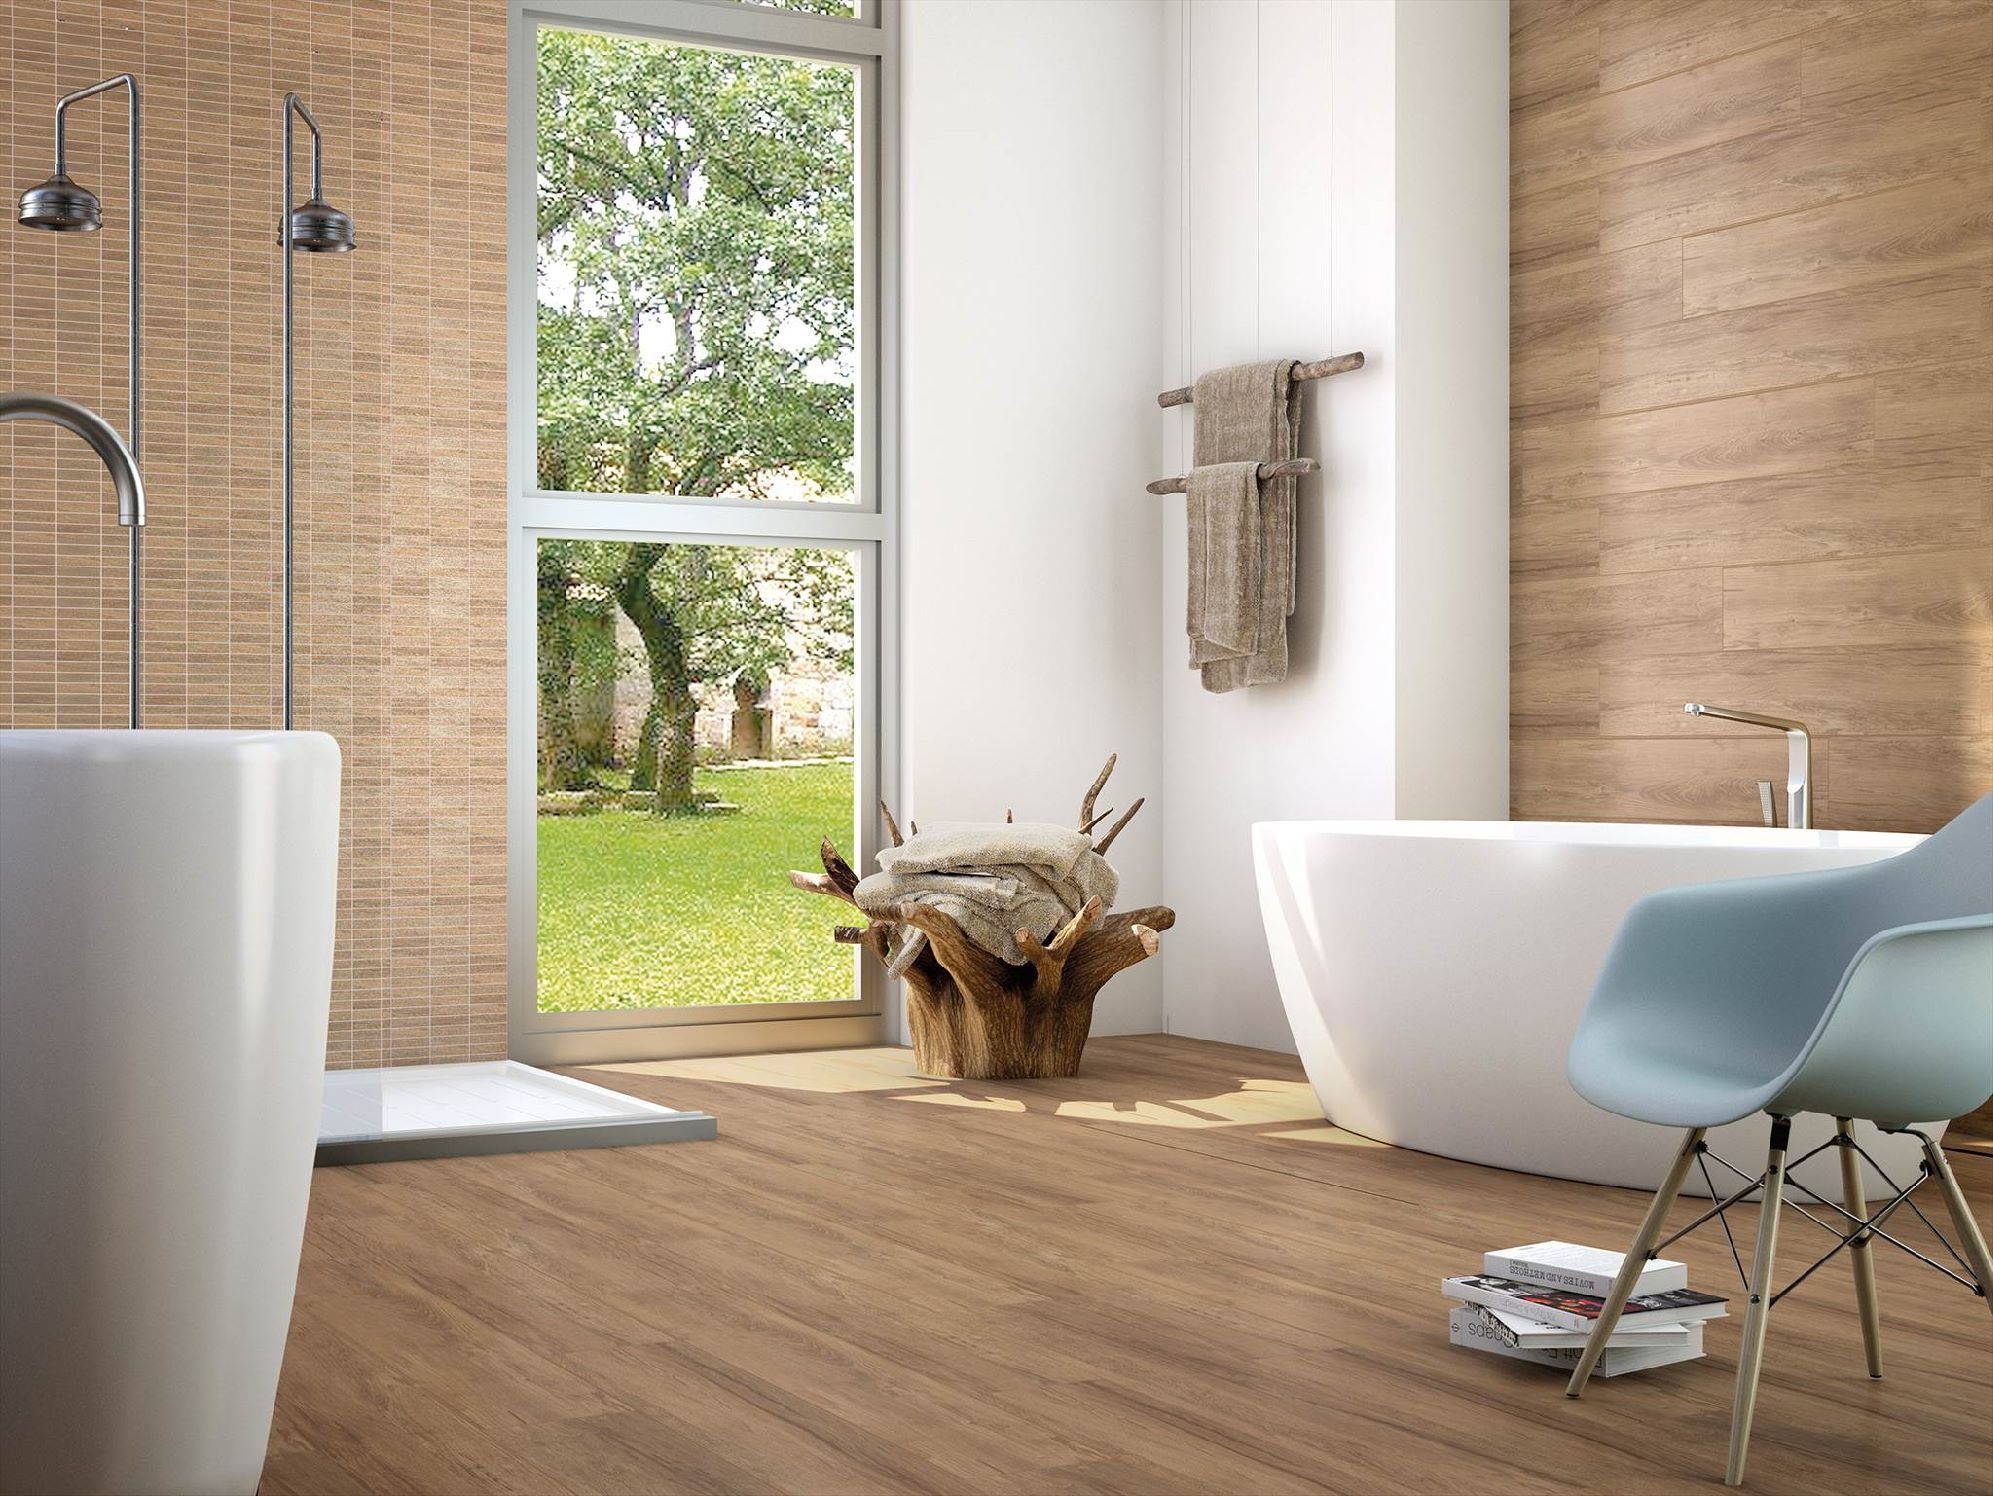 Bathroom Tile Wood Look Casona Beige 8 X 48 Porcelain Wood Look Tile  Casona  Wood Look